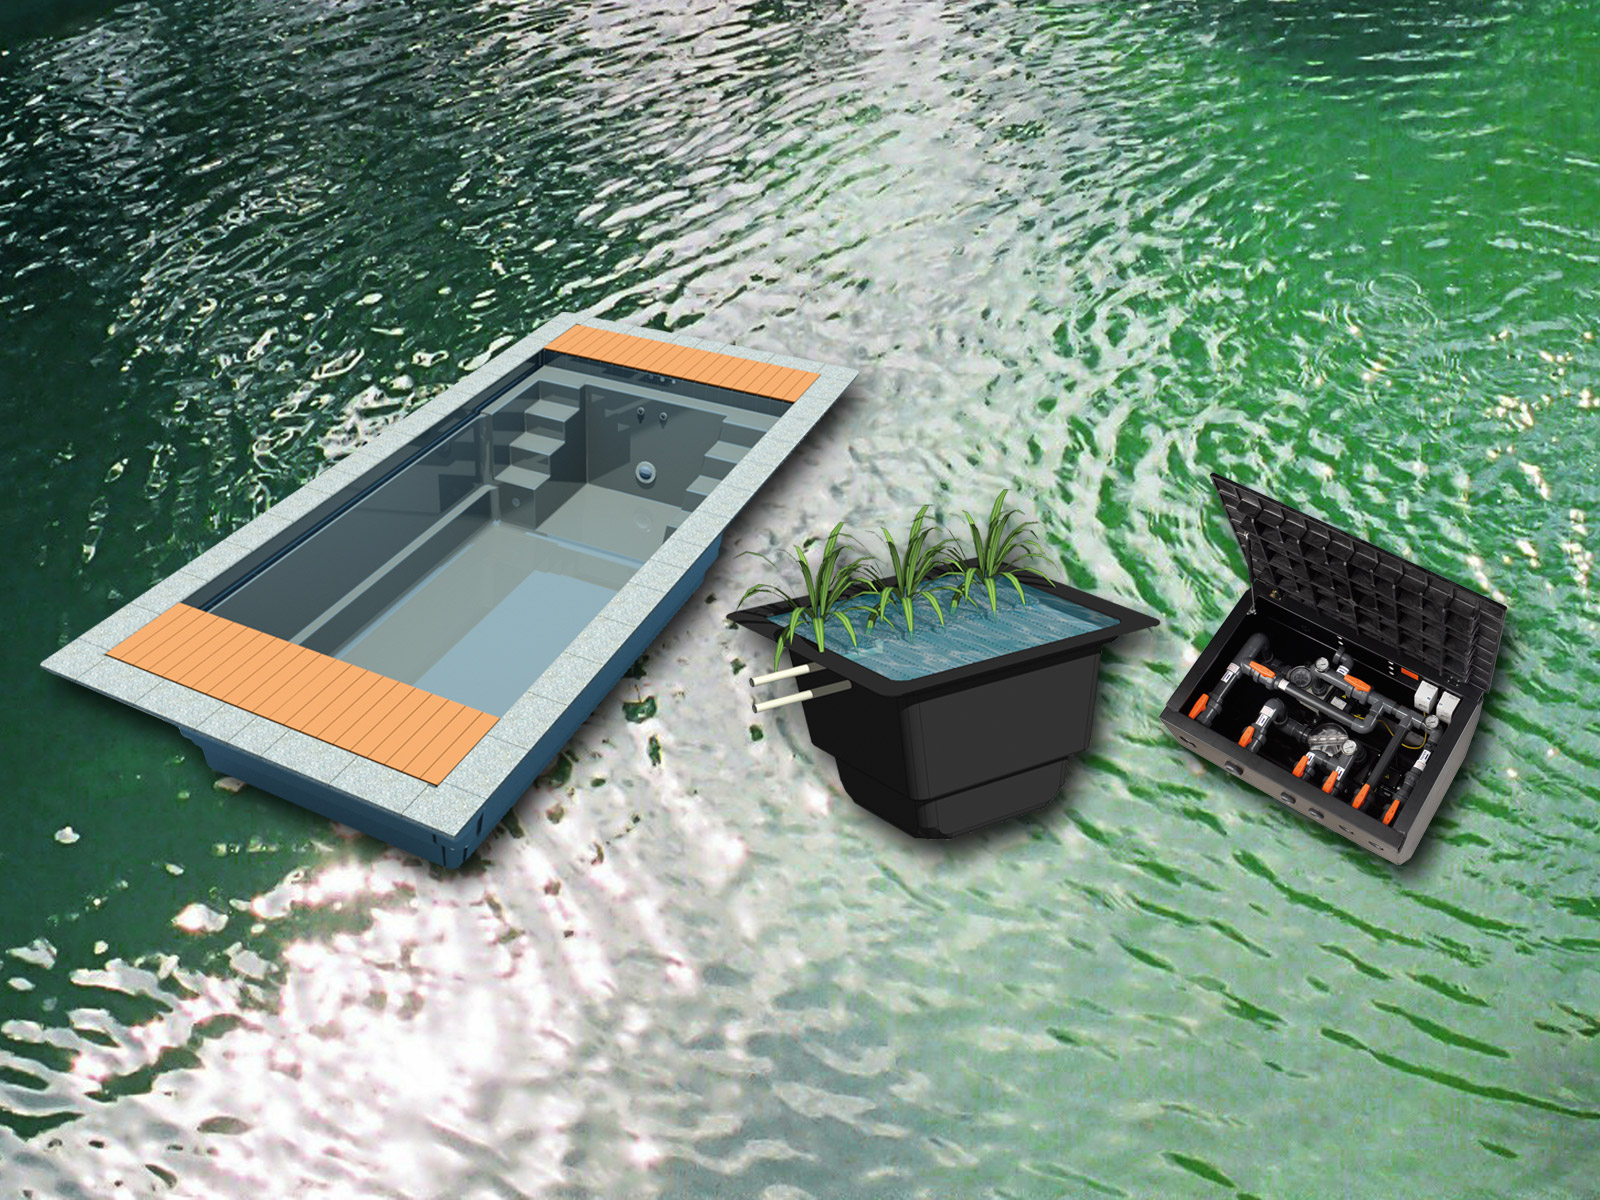 System balenapool for Fertigbecken pool